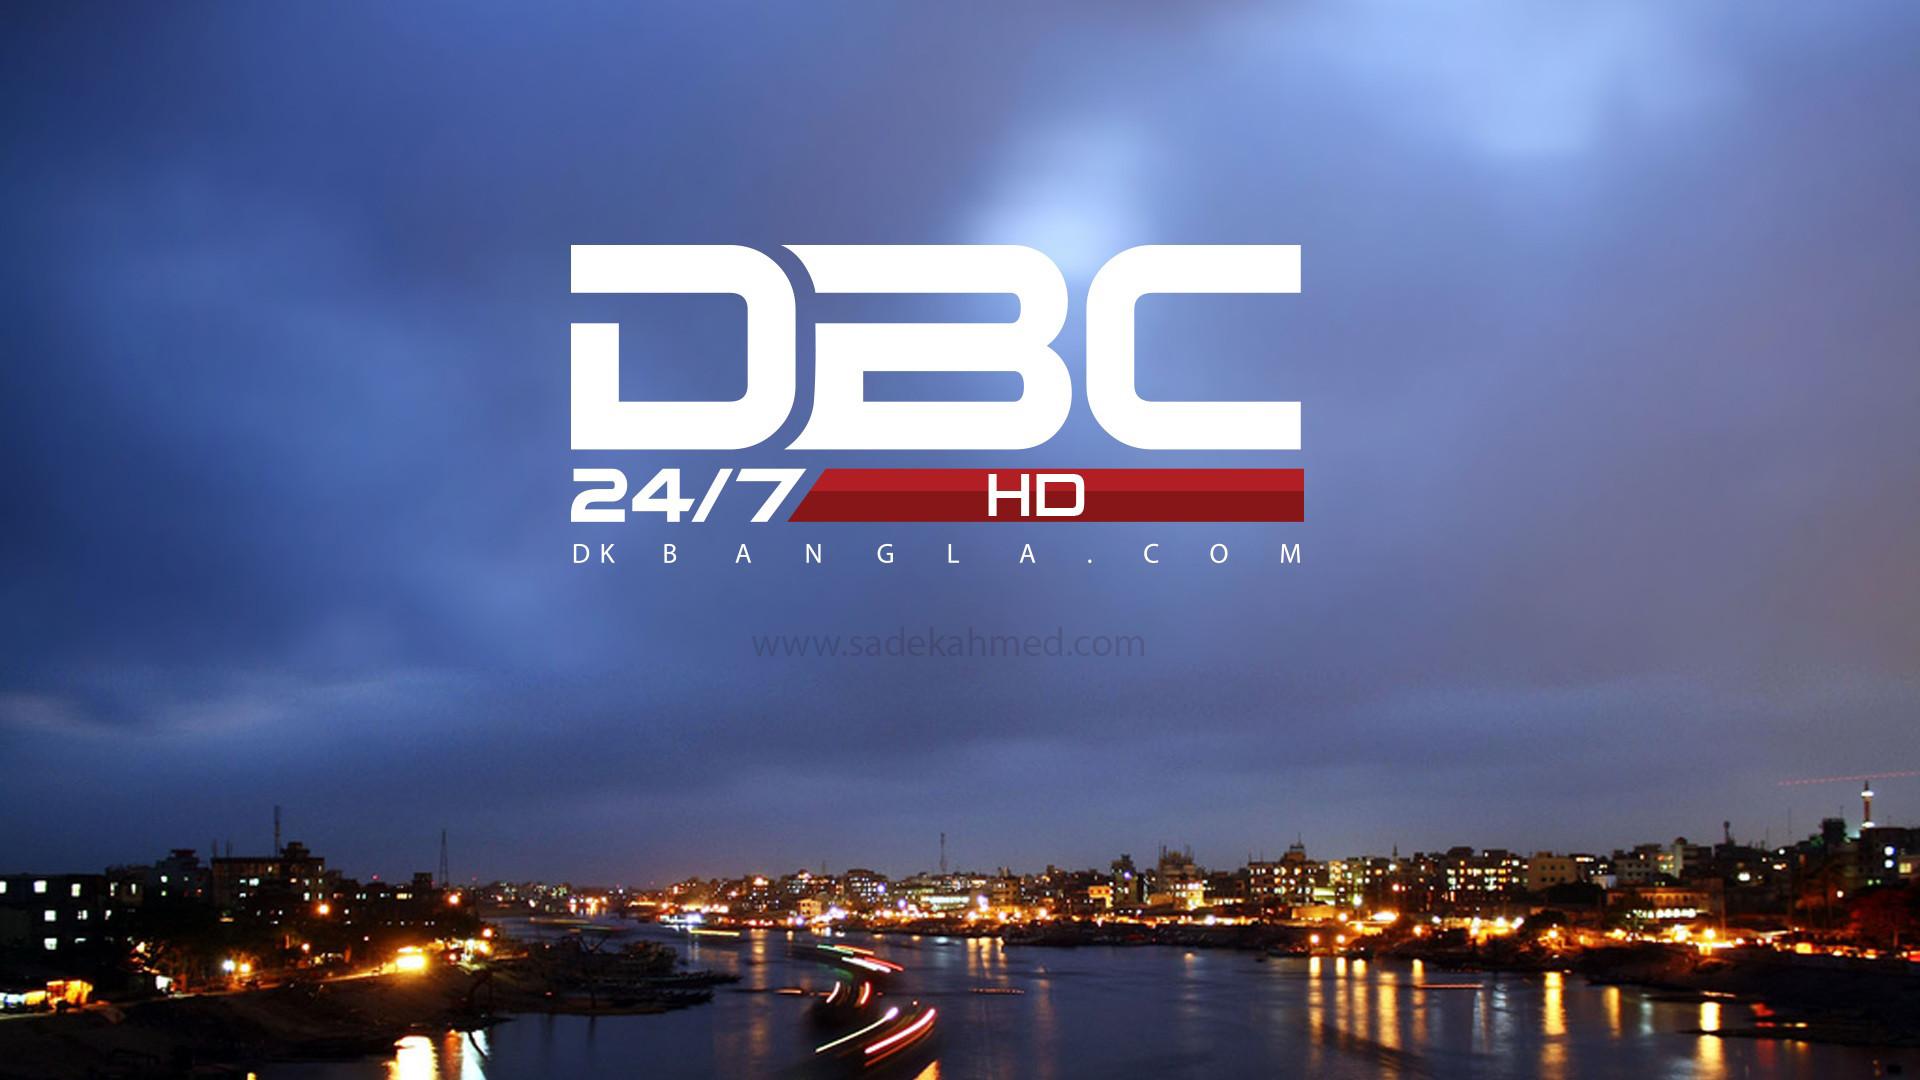 ArtStation - DBC NEWS   24 x 7   LIVE   SATELLITE NEWS